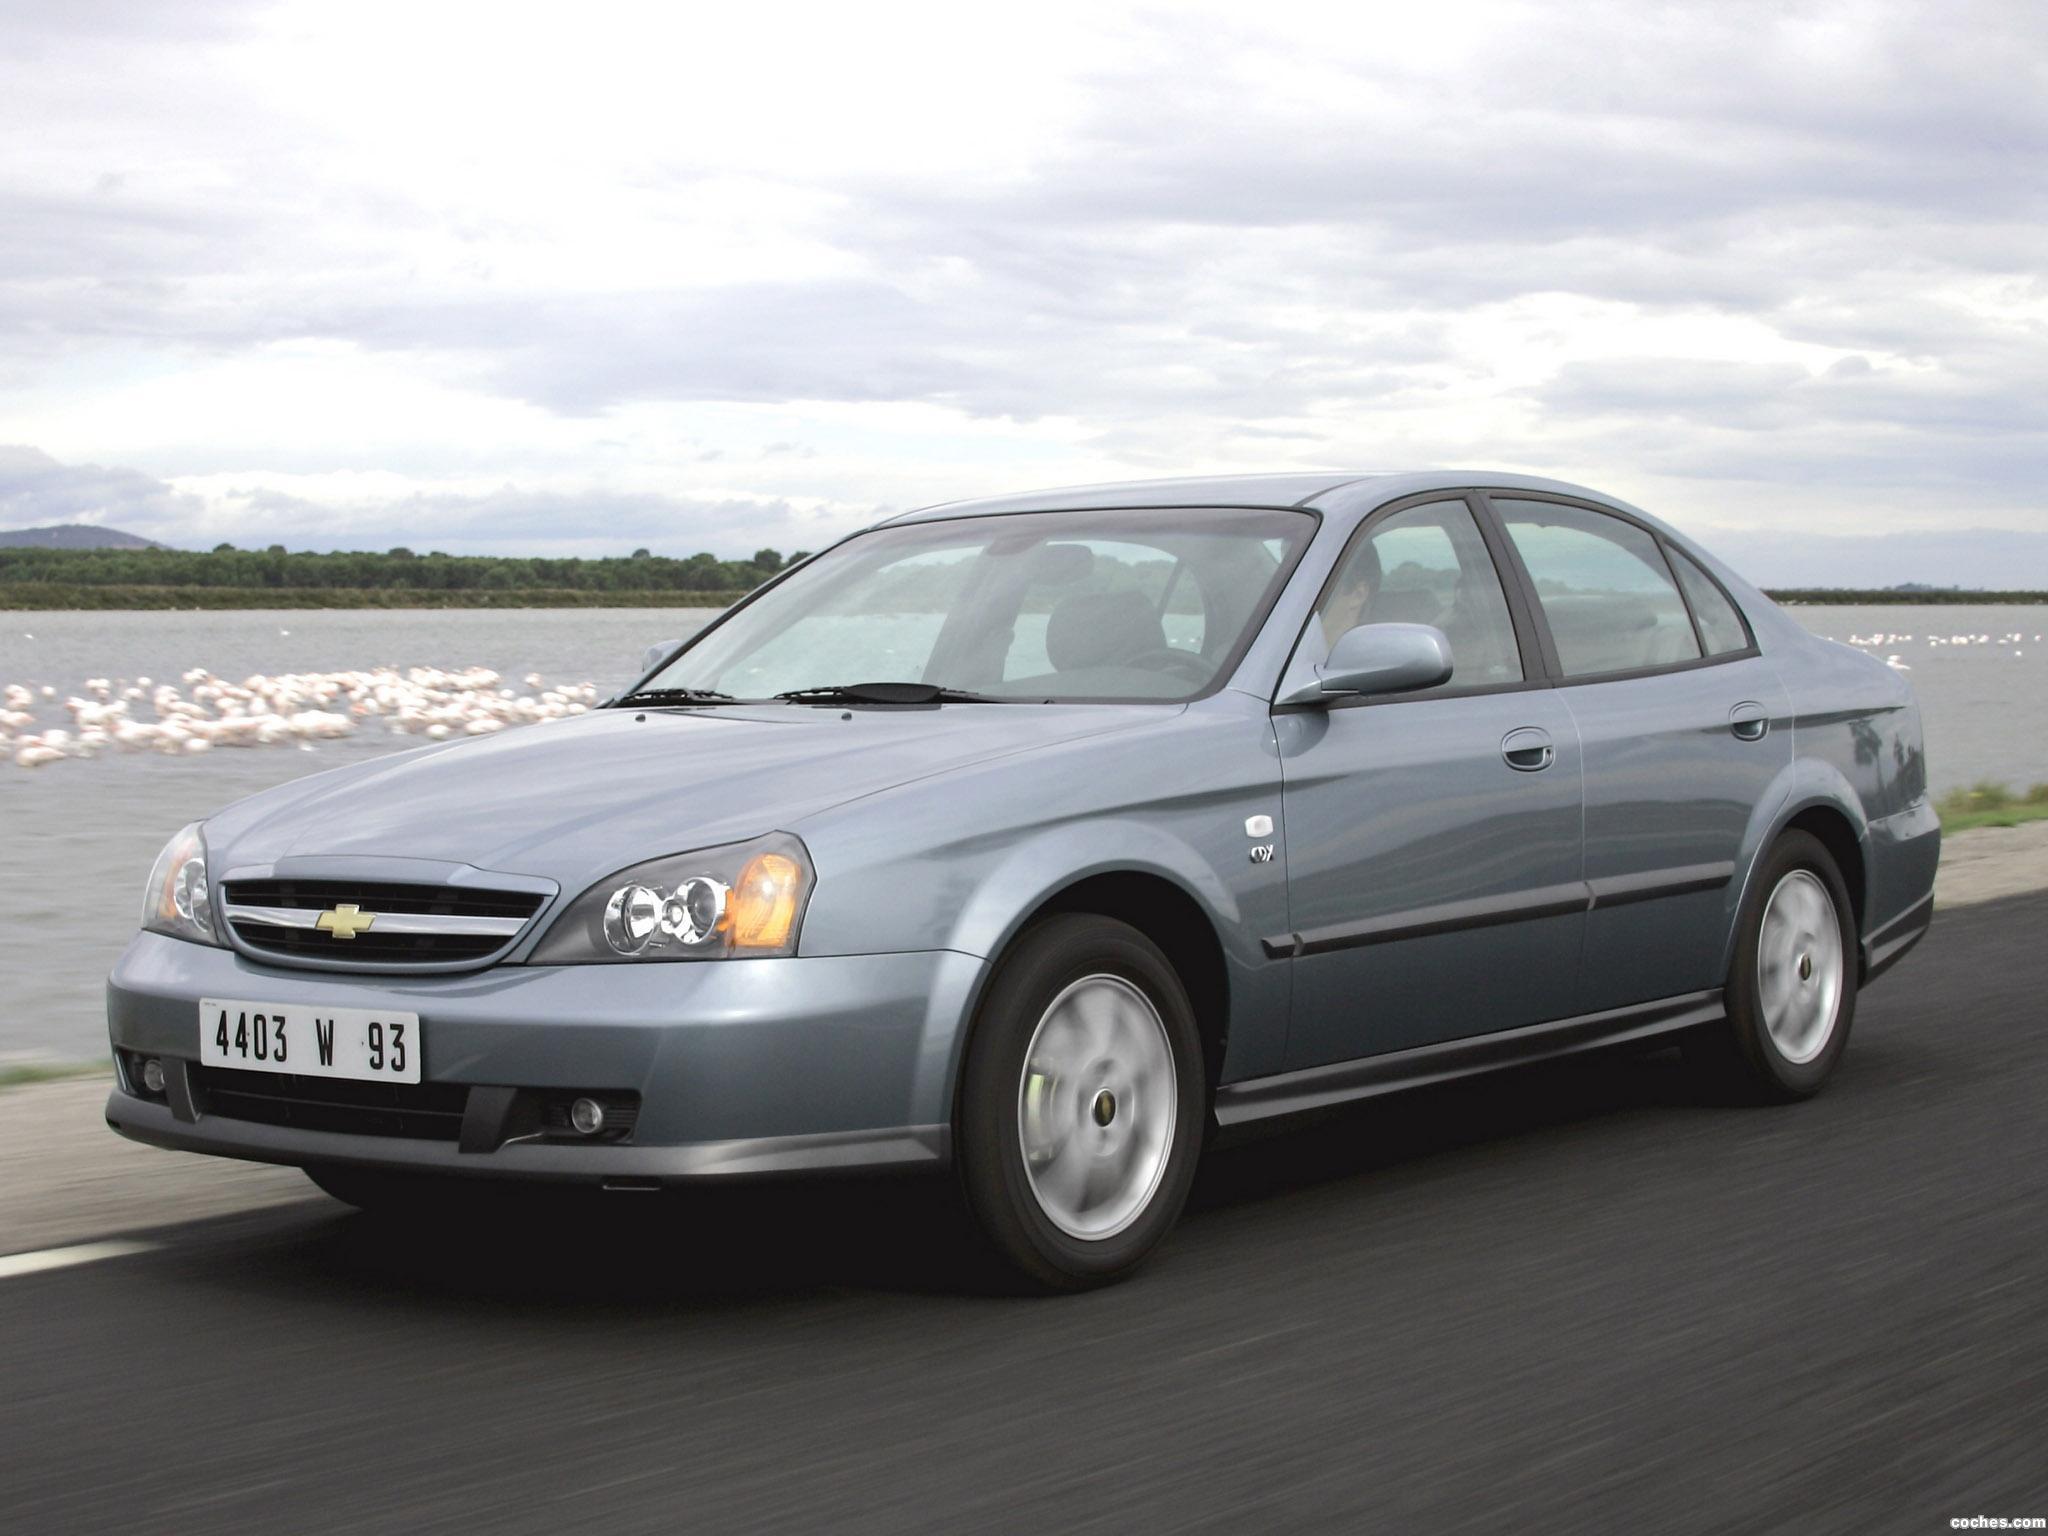 Foto 0 de Chevrolet Evanda 2004